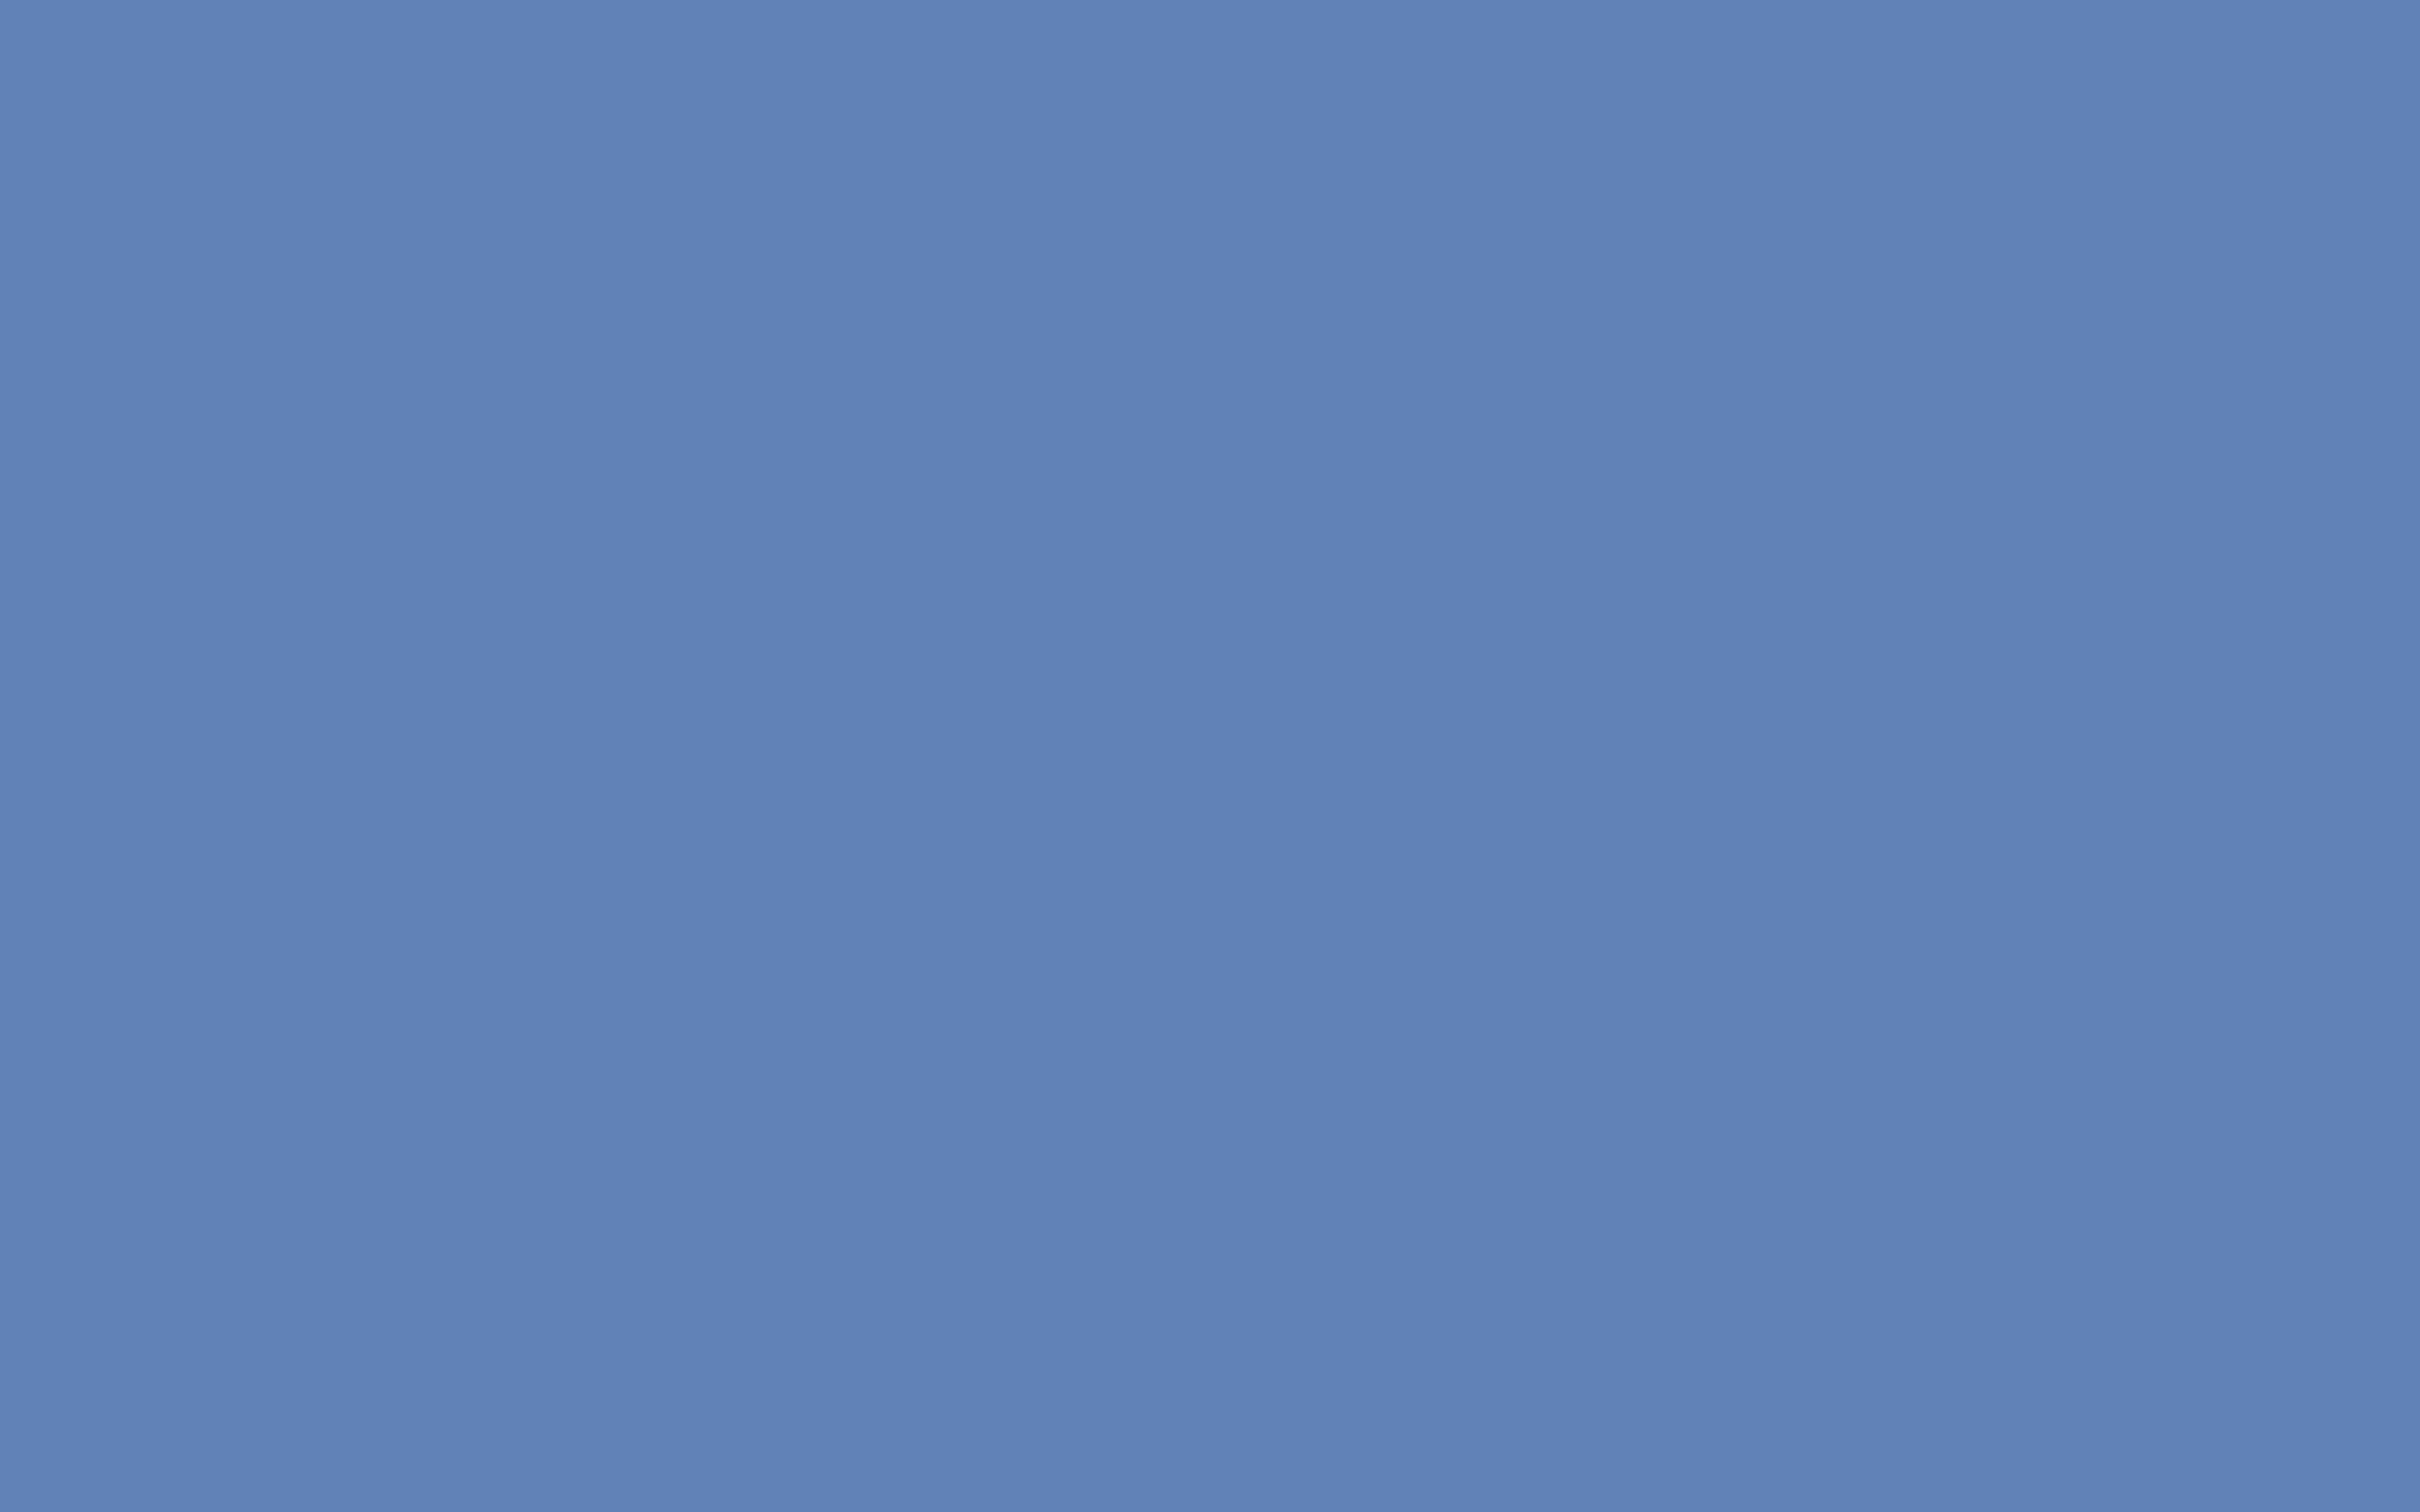 2560x1600 Glaucous Solid Color Background